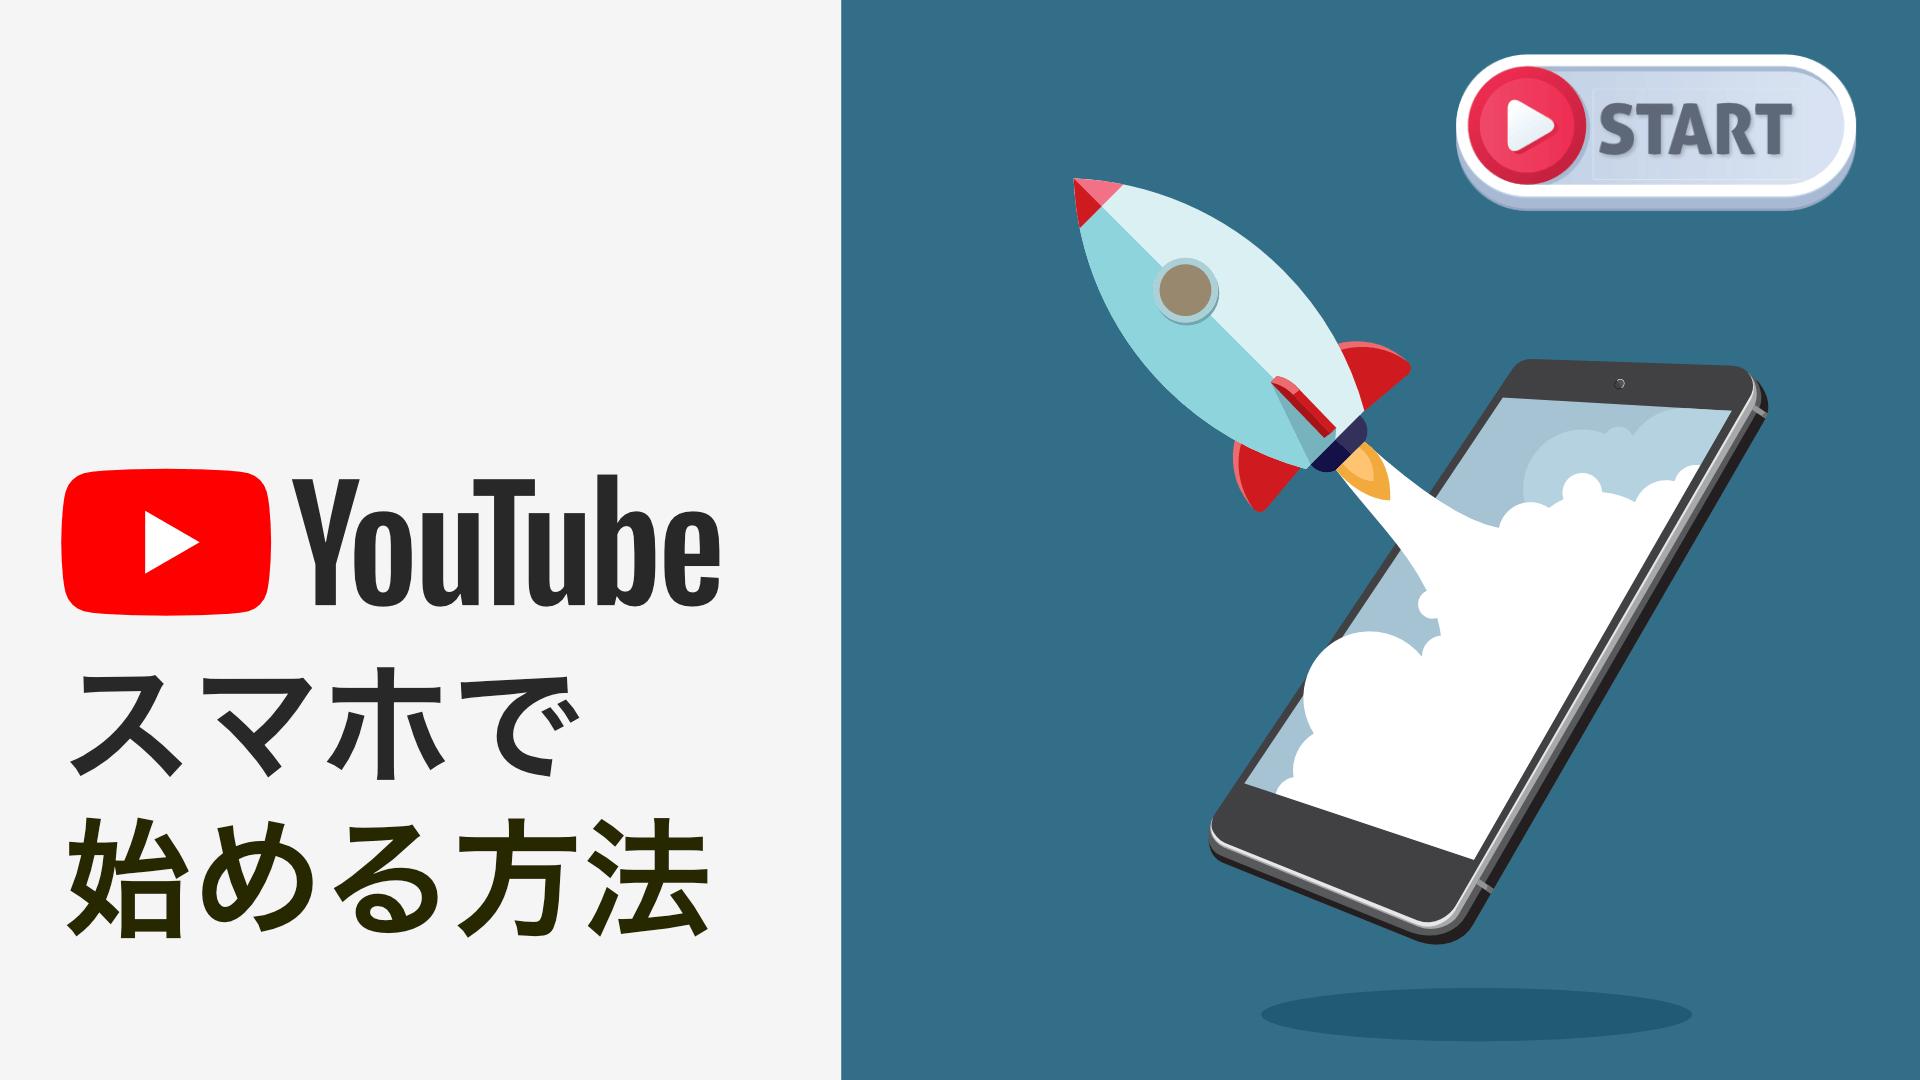 Youtube 動画 上げ 方